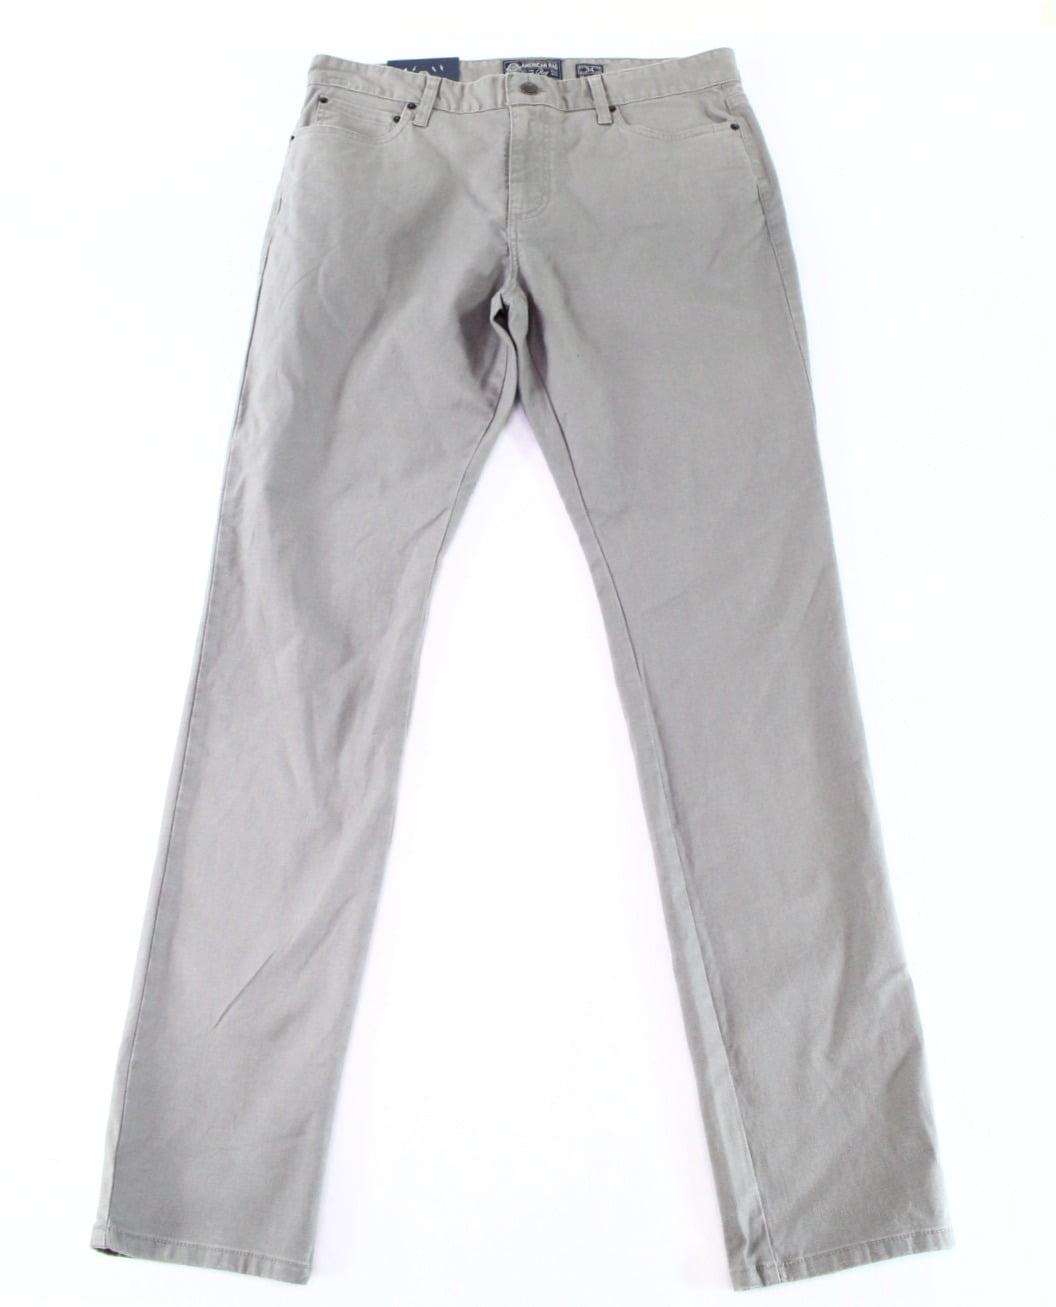 Mens 34x34 Slim-Fit Skinny Stretch Jeans 34